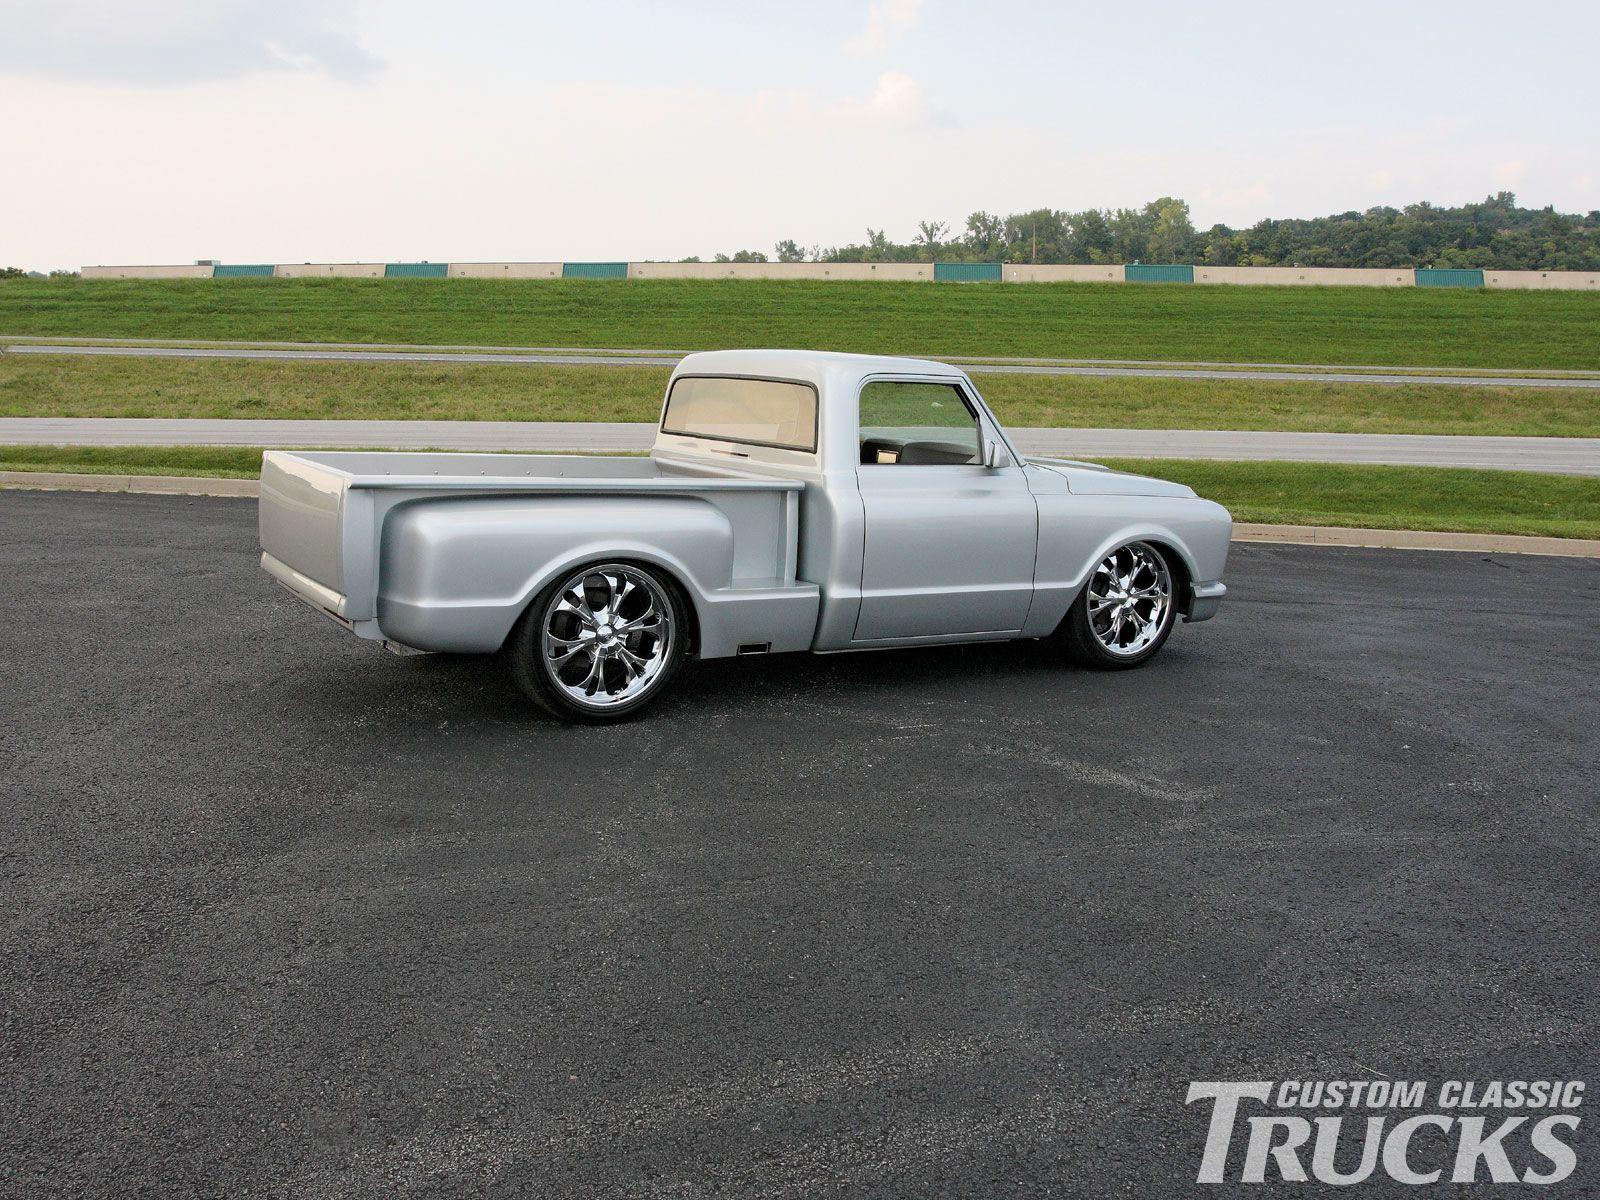 Custom pickup trucks 1967 chevy c10 pickup truck aftermarket rims